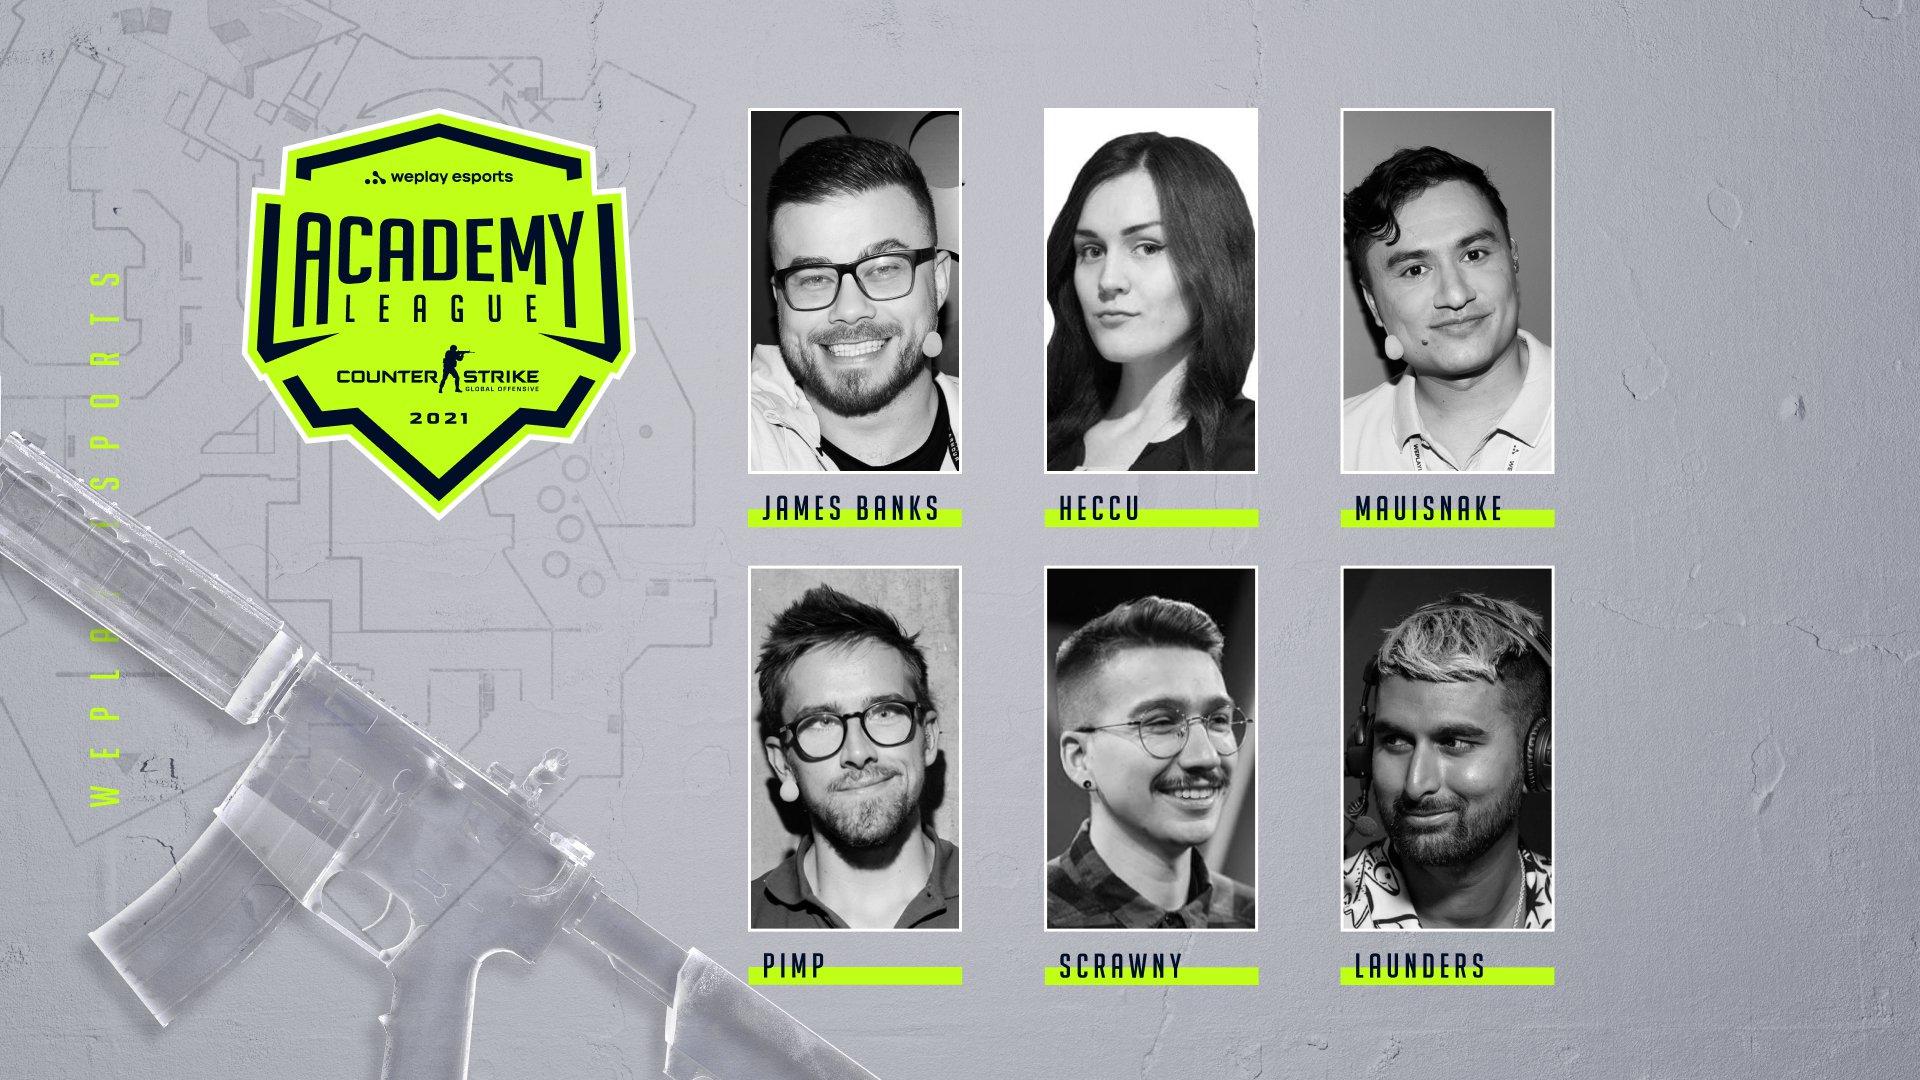 Англоговорящая команда талантов WePlay Academy League Season 2. Изображение: WePlay Holding